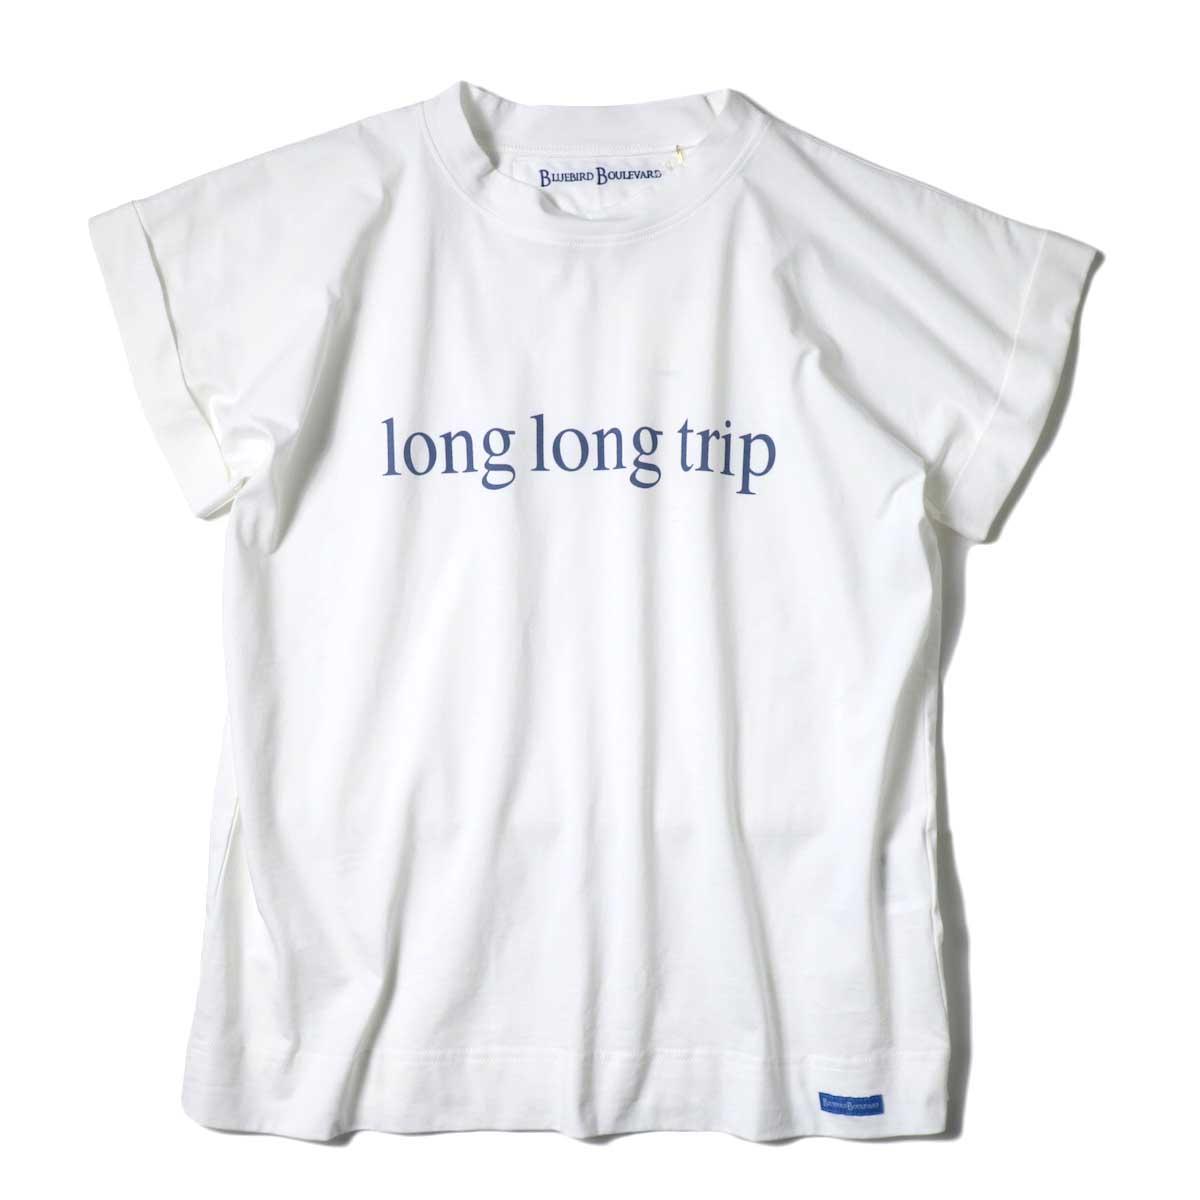 BLUEBIRD BOULEVARD / Long Long Trip ロゴTee (White)